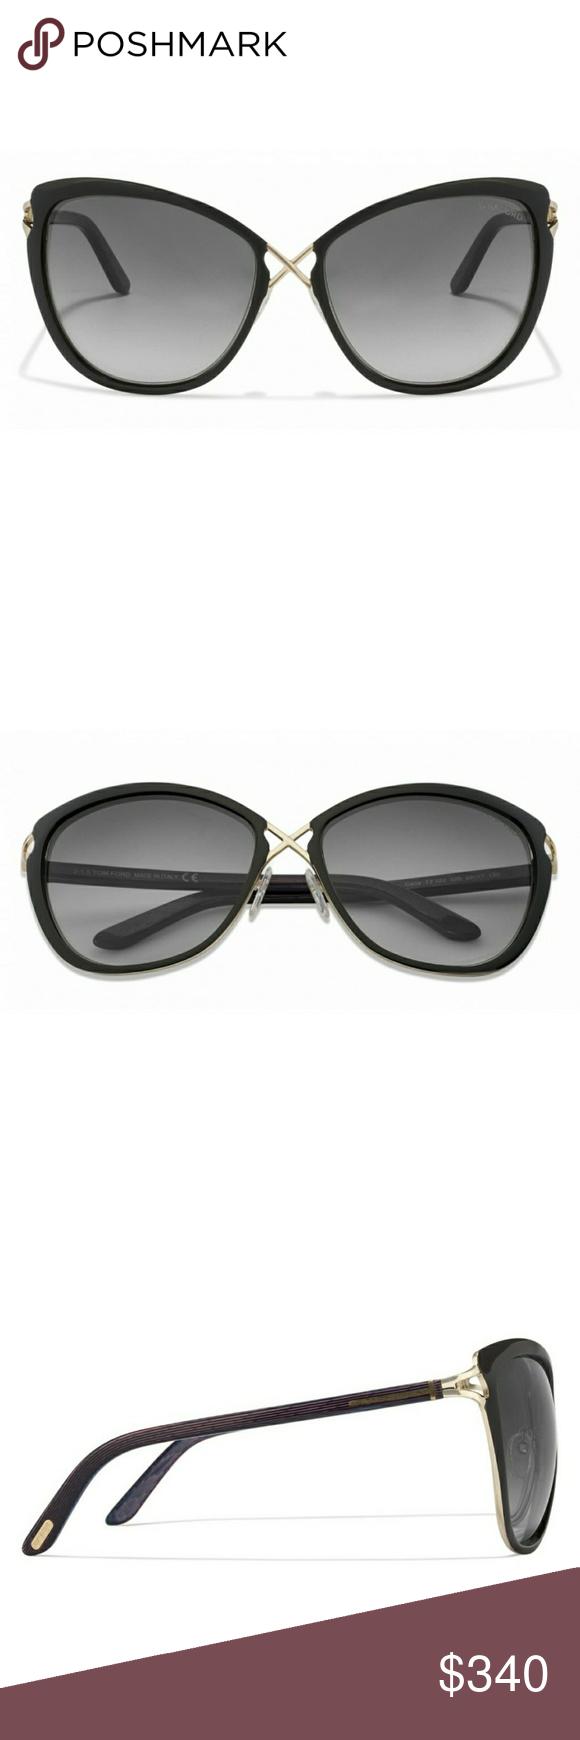 7131fc243e6594 Authentic Tom Ford Women s sunglasses with case Black Golden Pink Blue  Gradient 32B Women s Sunglasses.